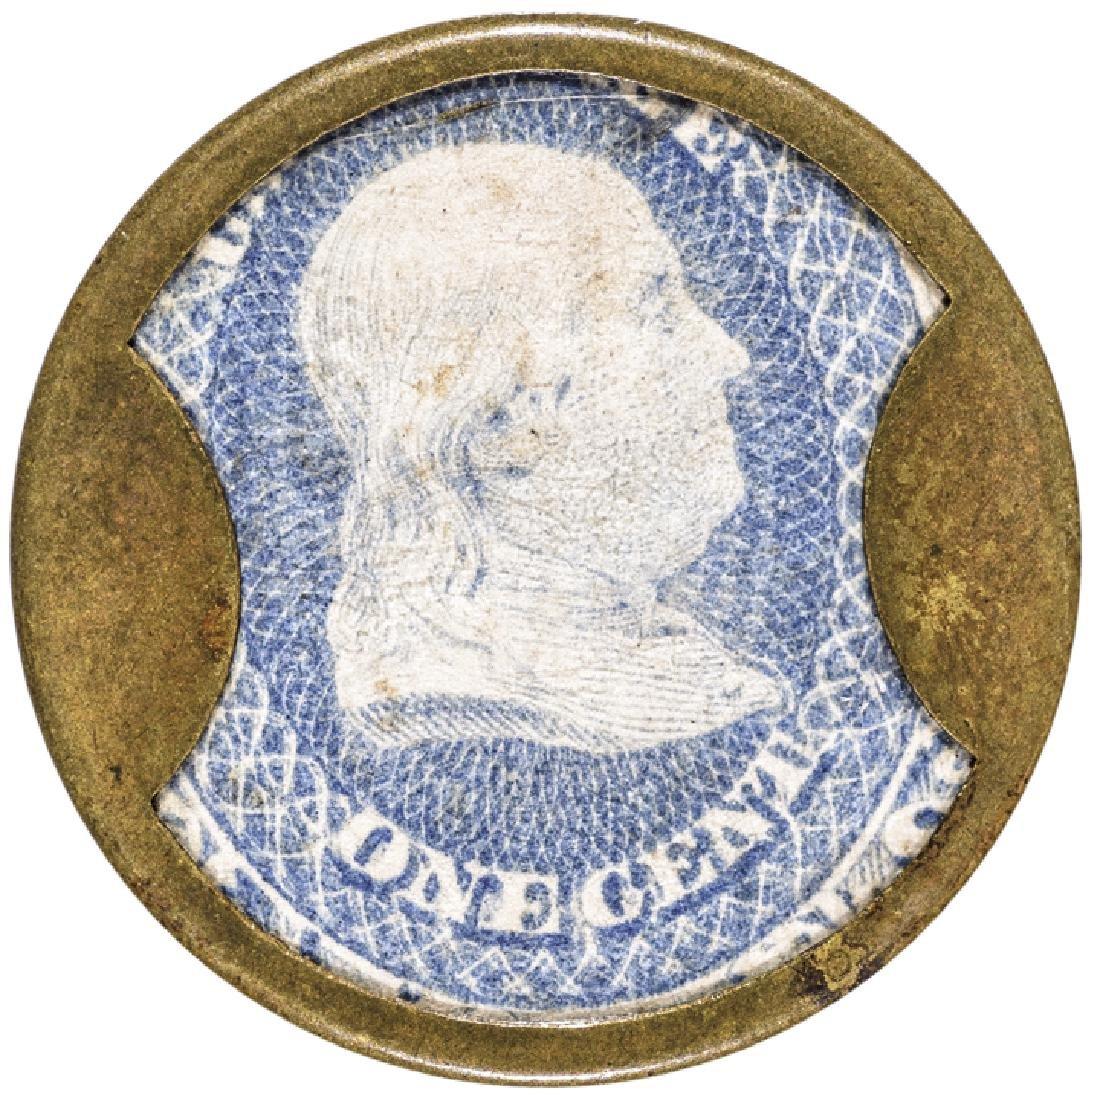 Encased Postage Stamp EP-8 1¢ F BUHL + CO Detroit